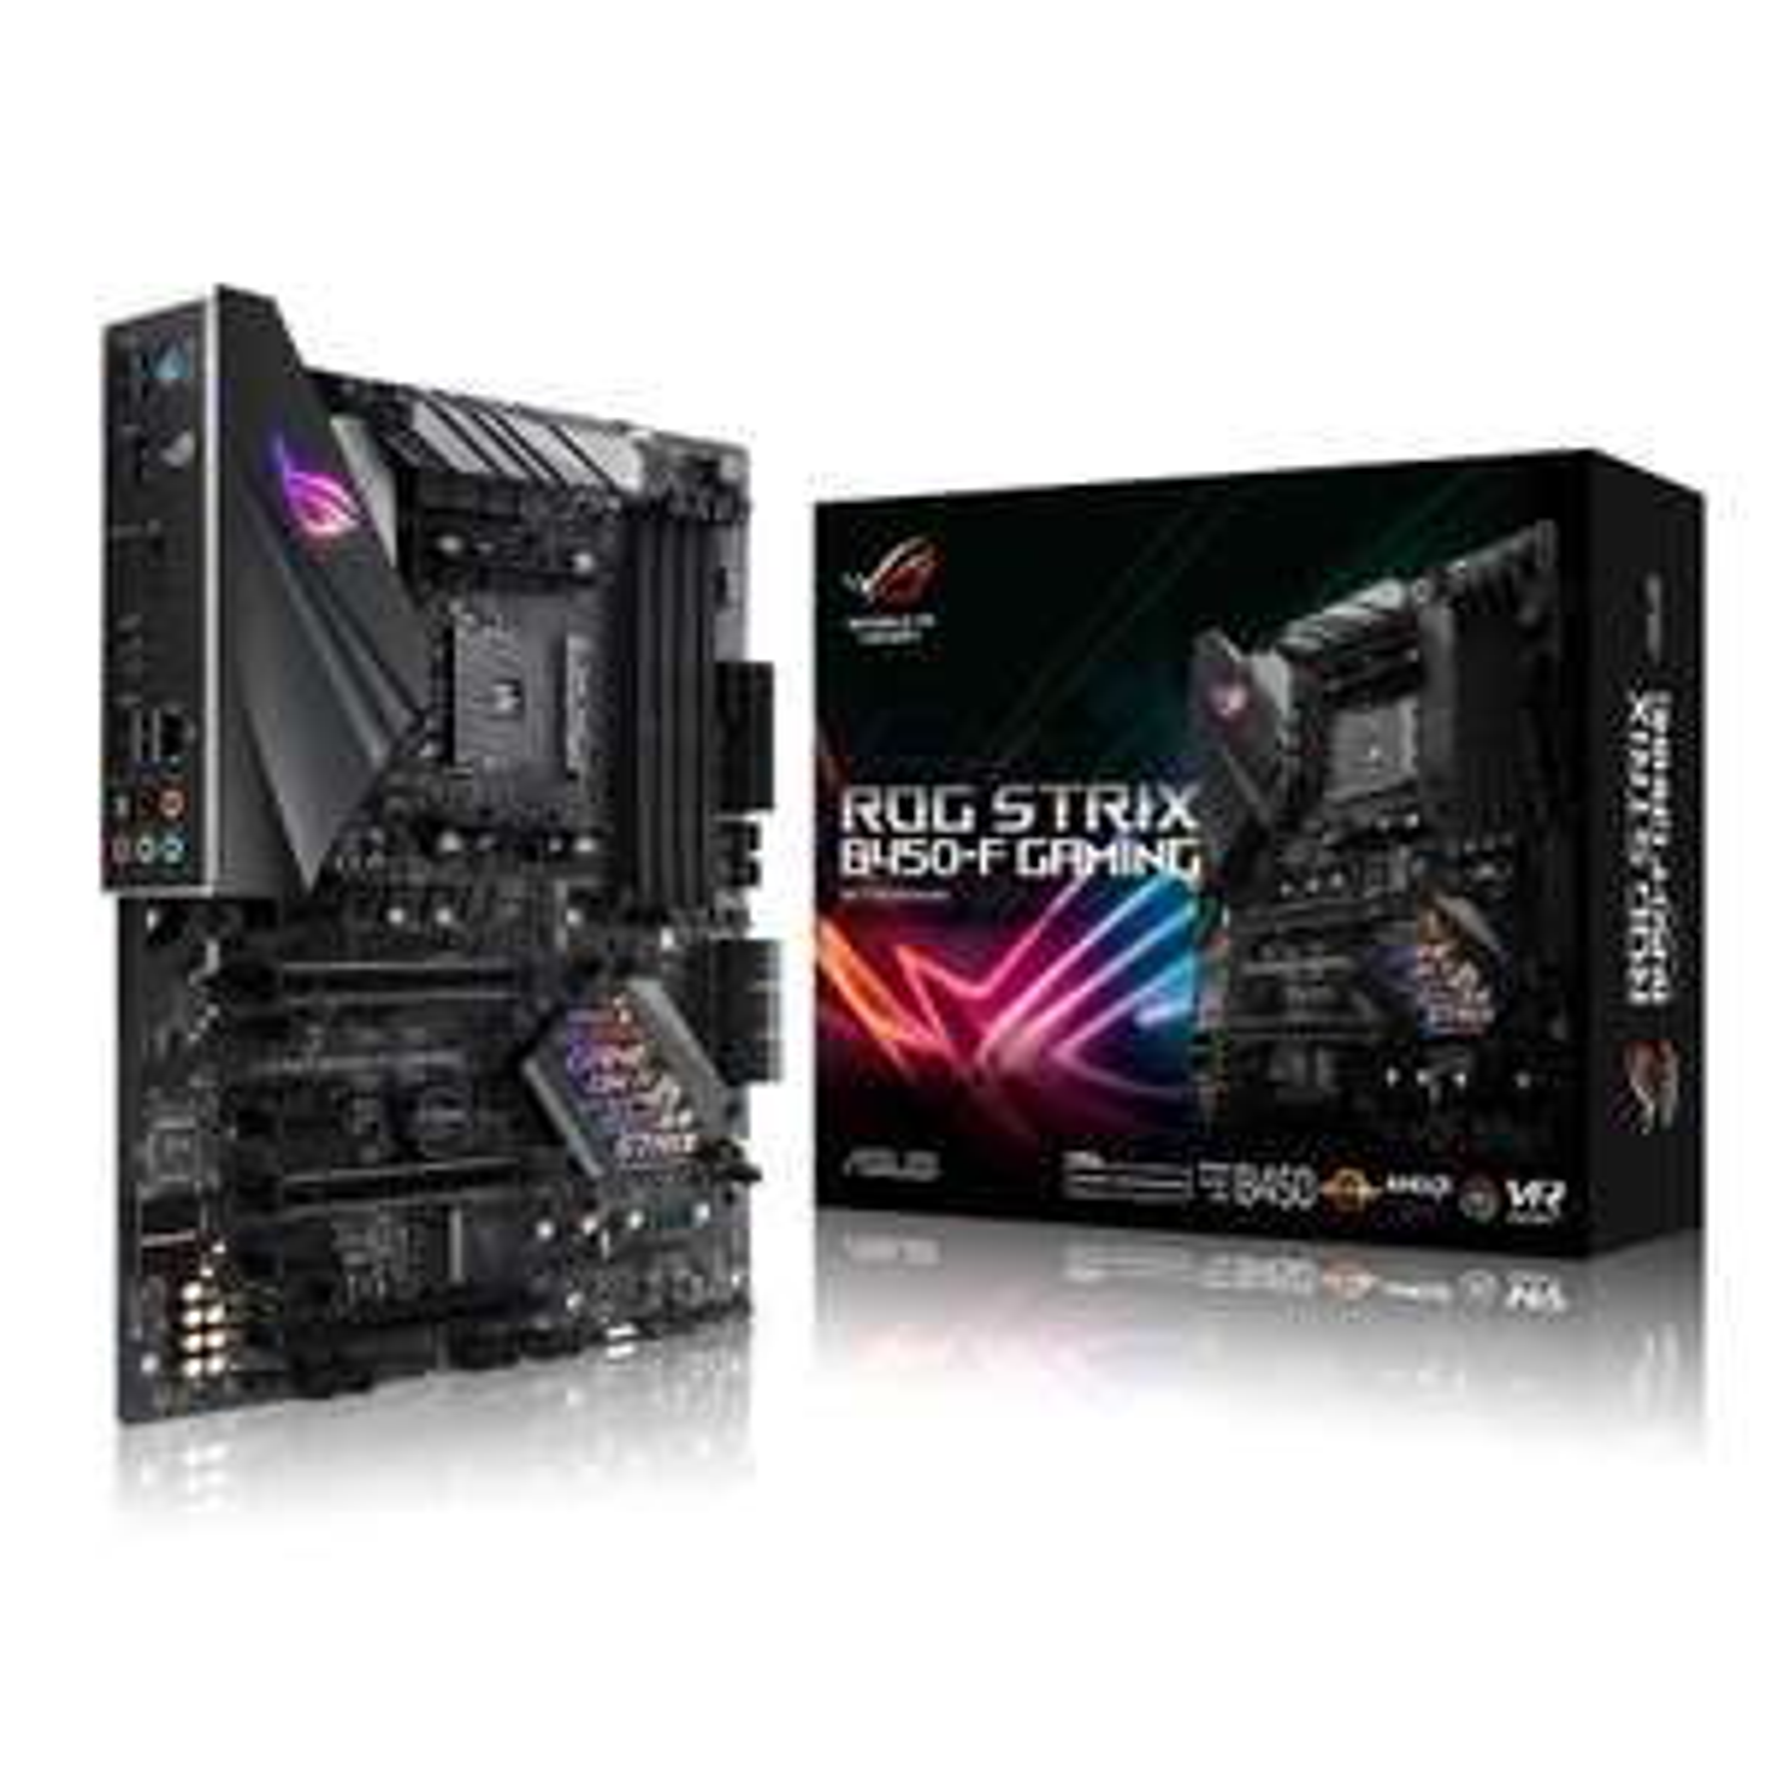 Asus ROG Strix B450-F Gaming Mainboard Sockel AM4 Bestpreis